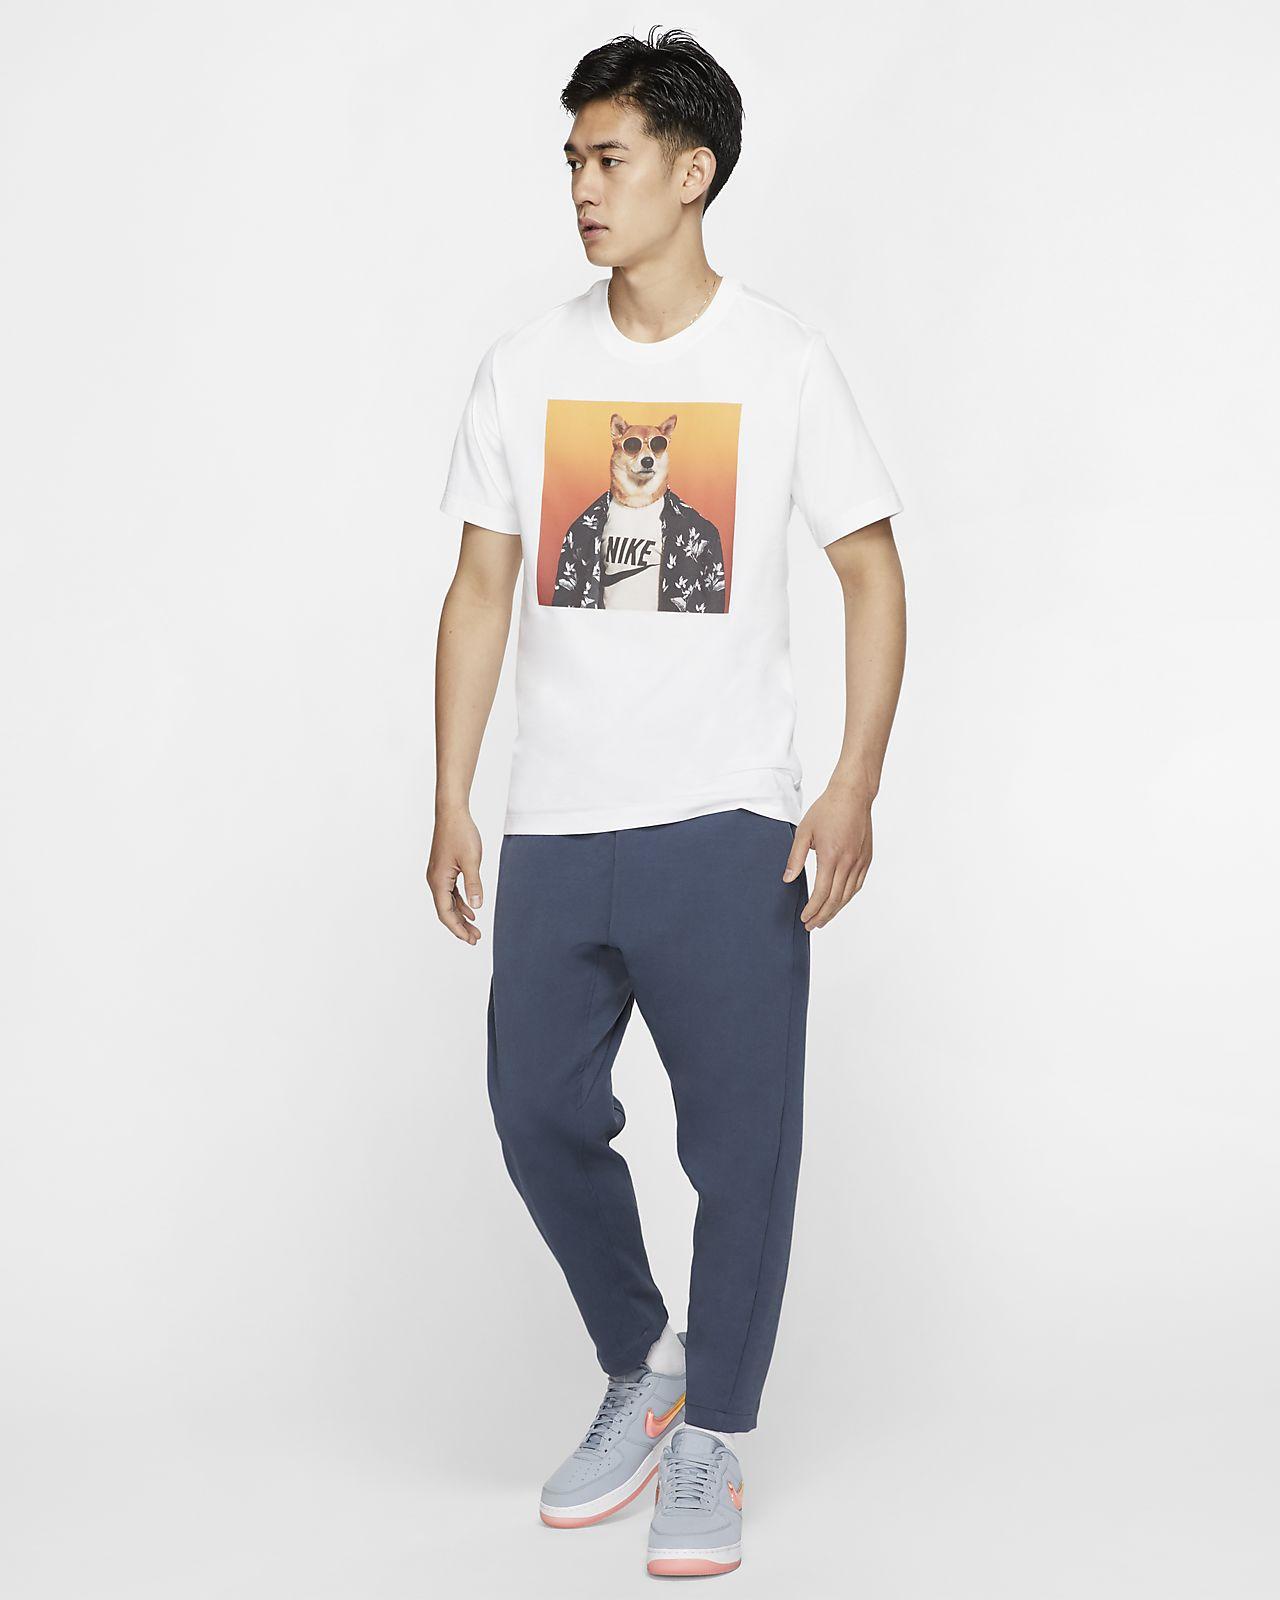 258e7fb317ef55 Nike Sportswear Men's T-Shirt. Nike.com ID